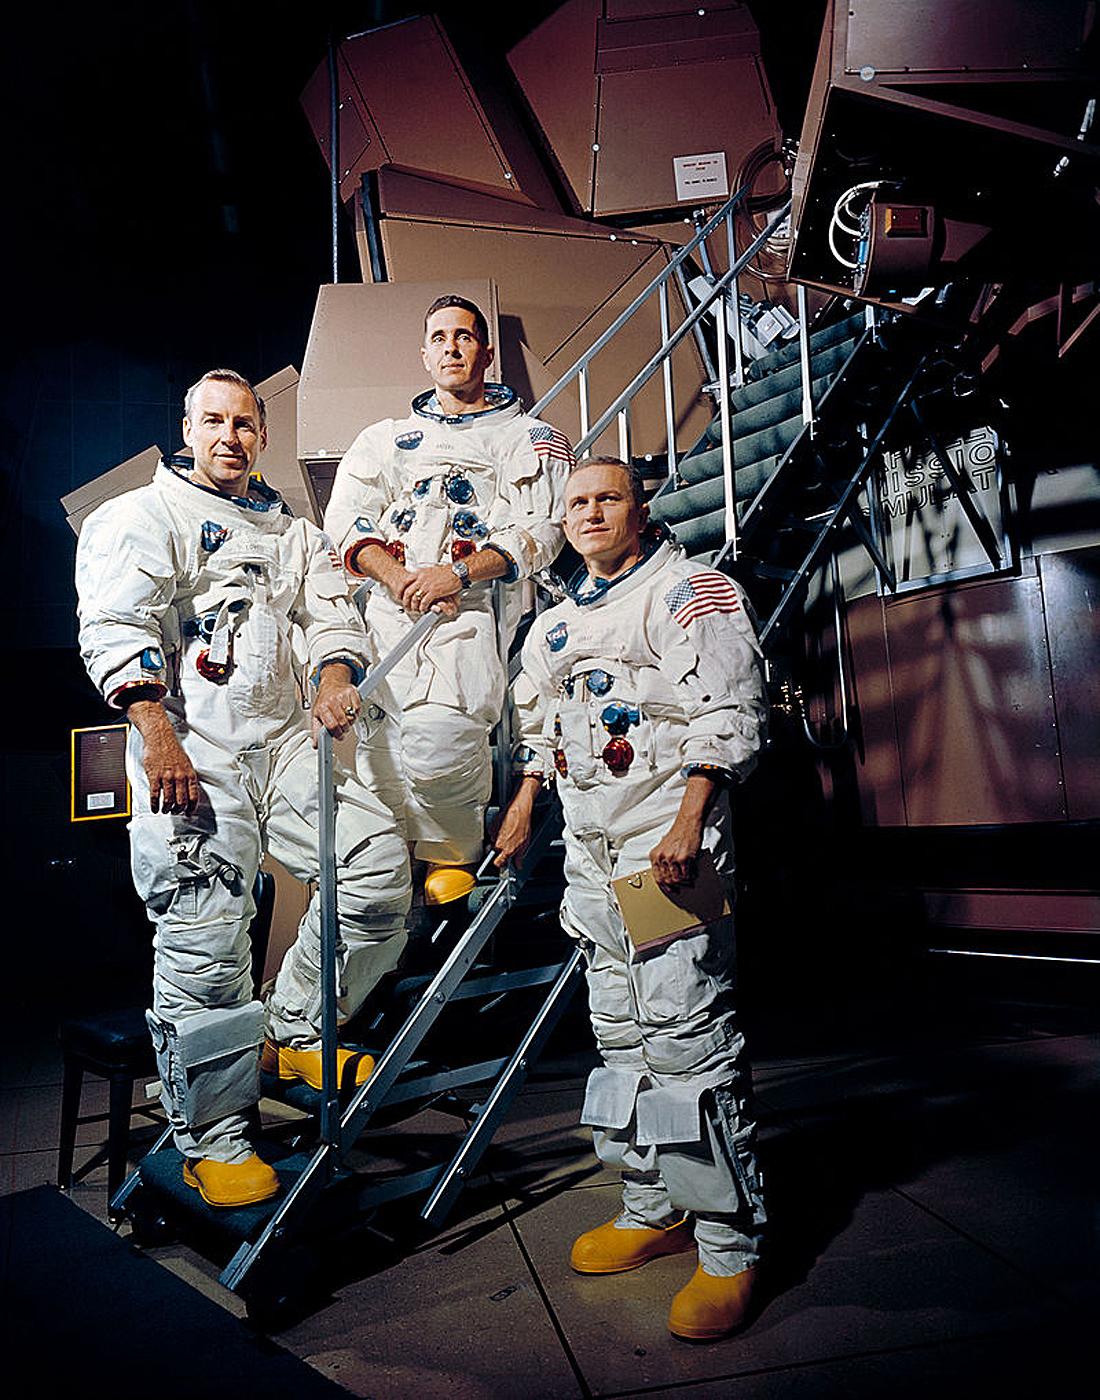 Apollo 8 NASA, crew members